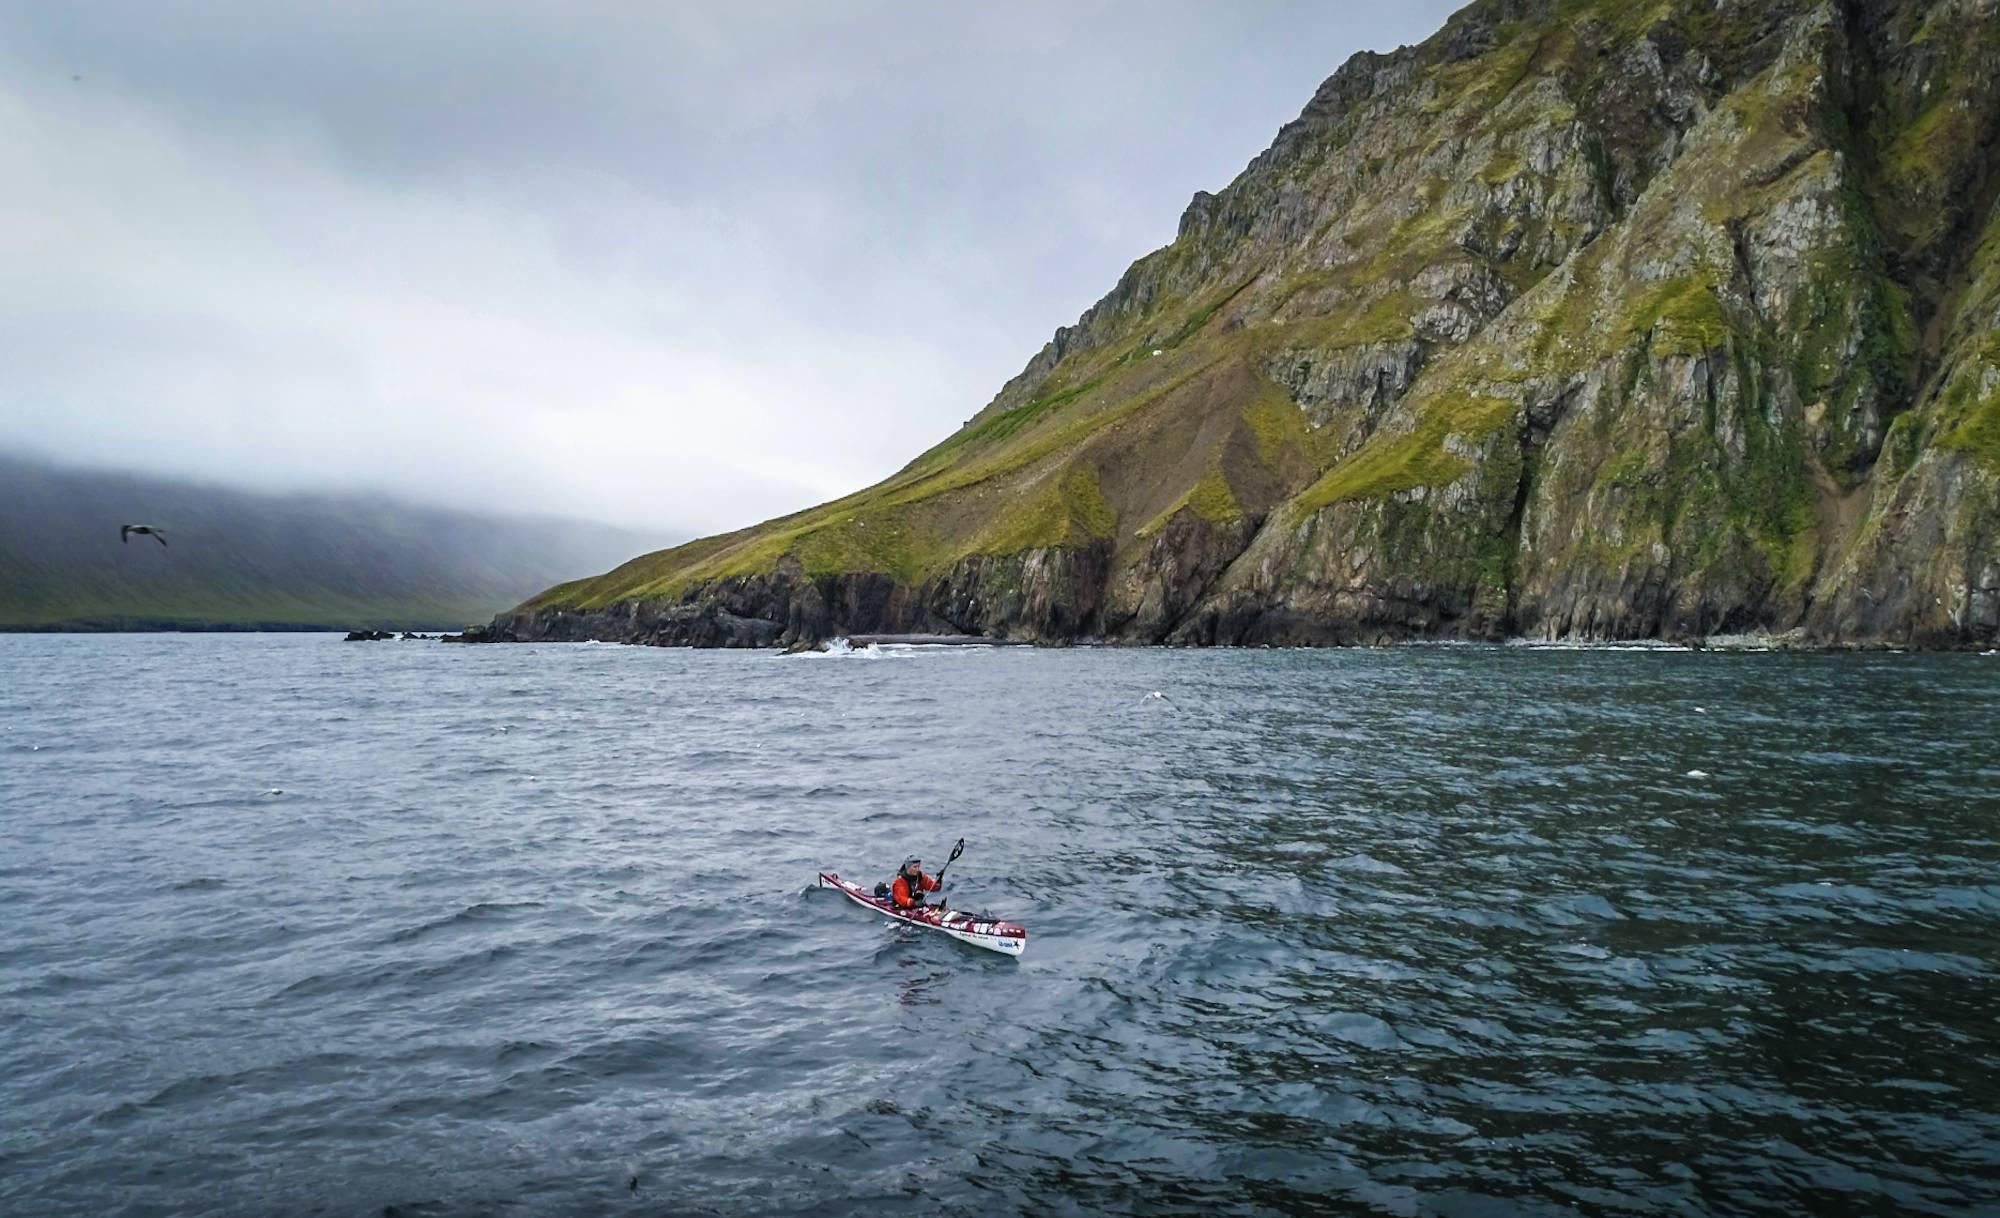 Veiga Gretarsdottir kayaking around Iceland in vast body of water